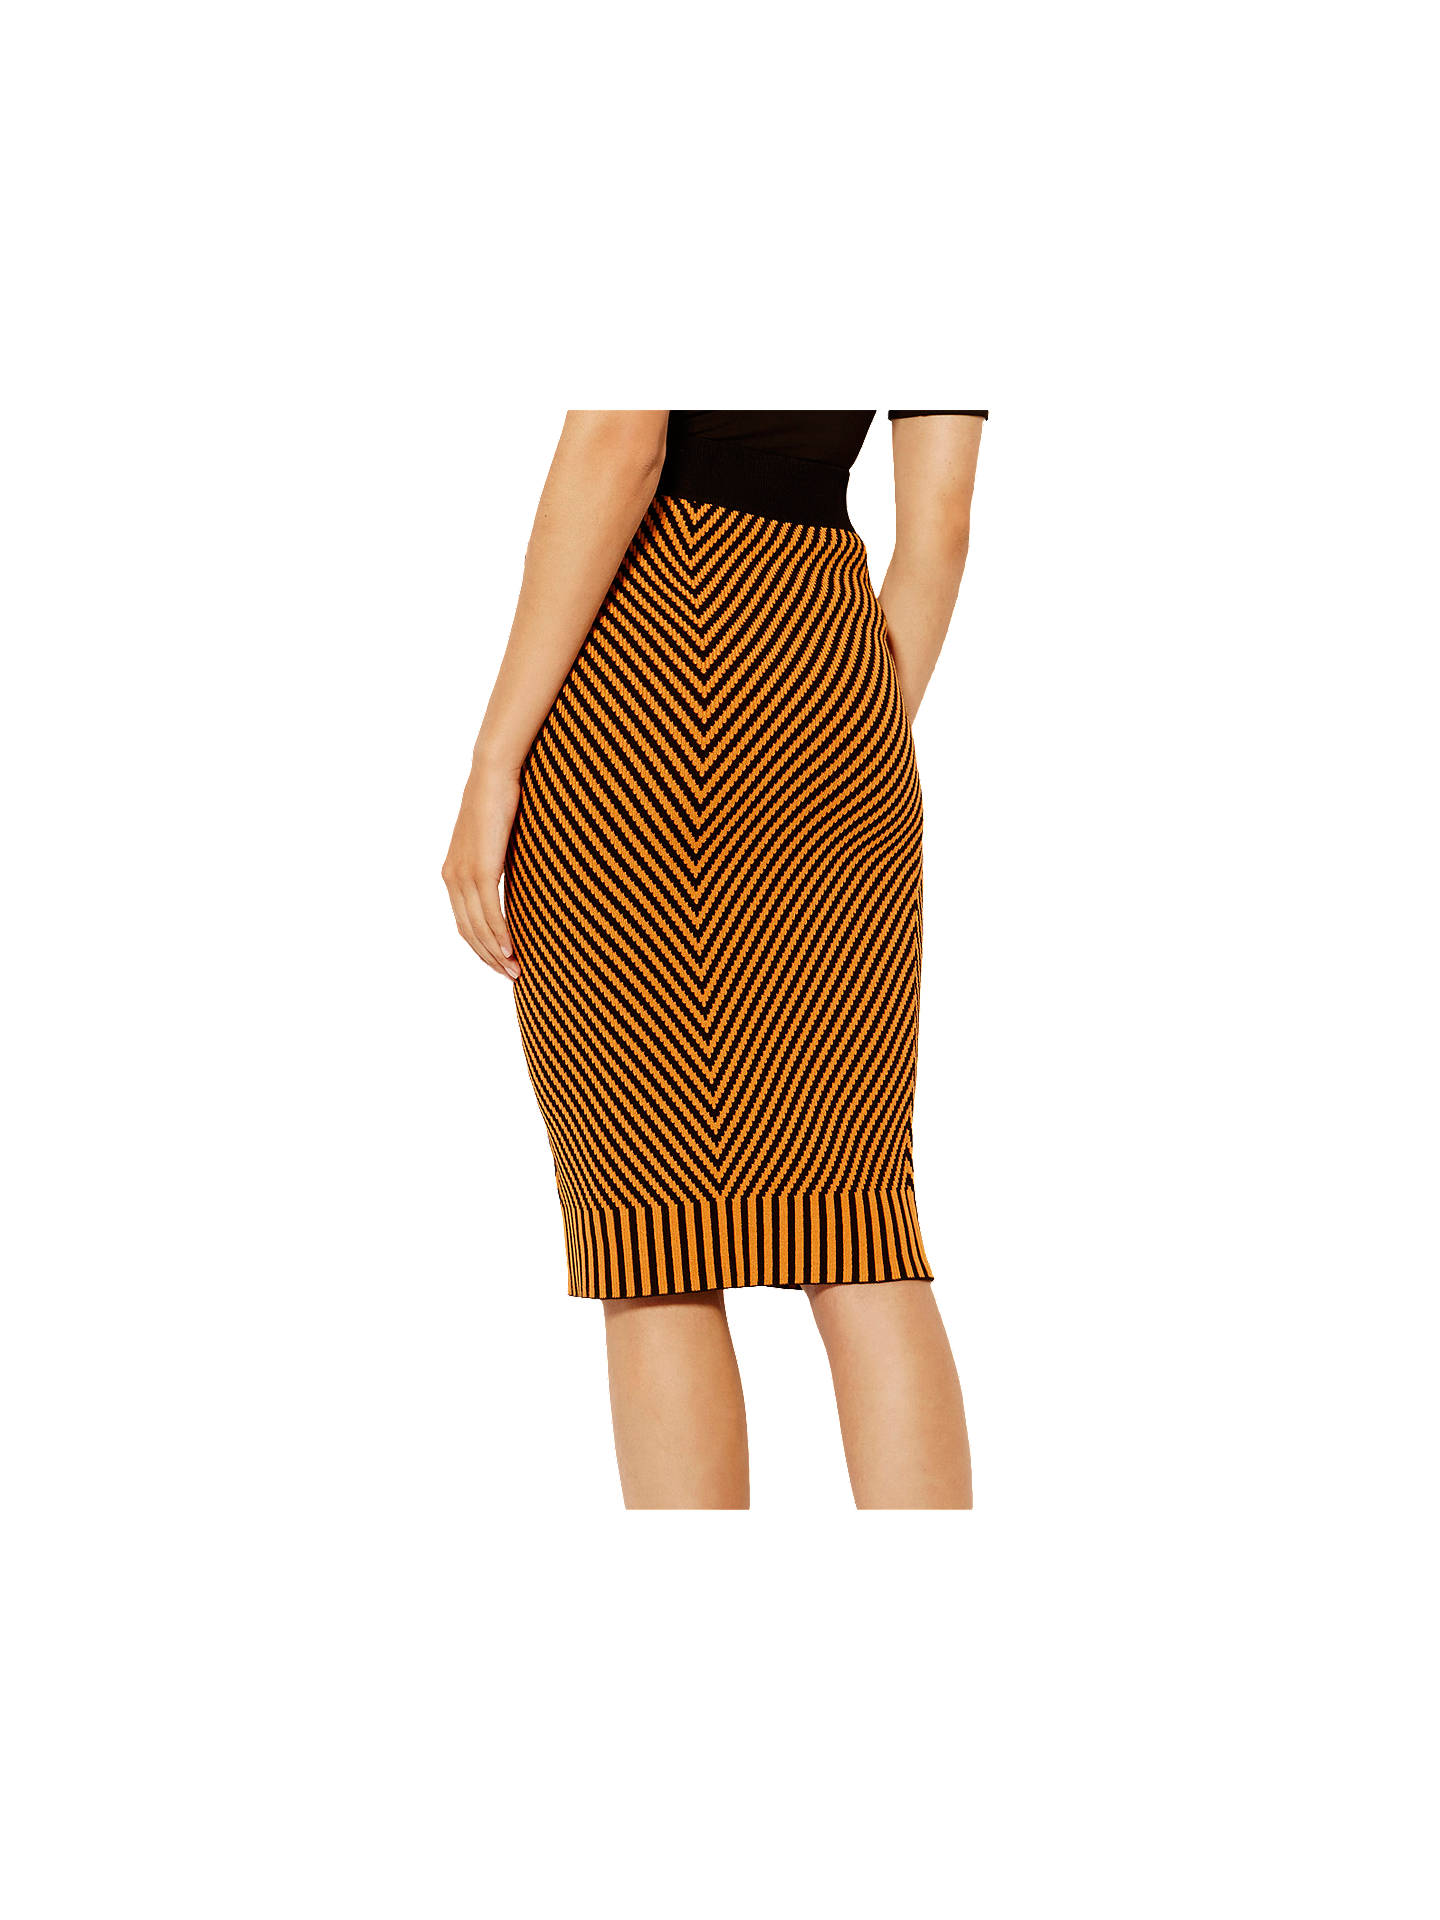 65a066cf75 ... Buy Karen Millen Contrast Knitted Pencil Skirt, Orange/Multi, XS Online  at johnlewis ...